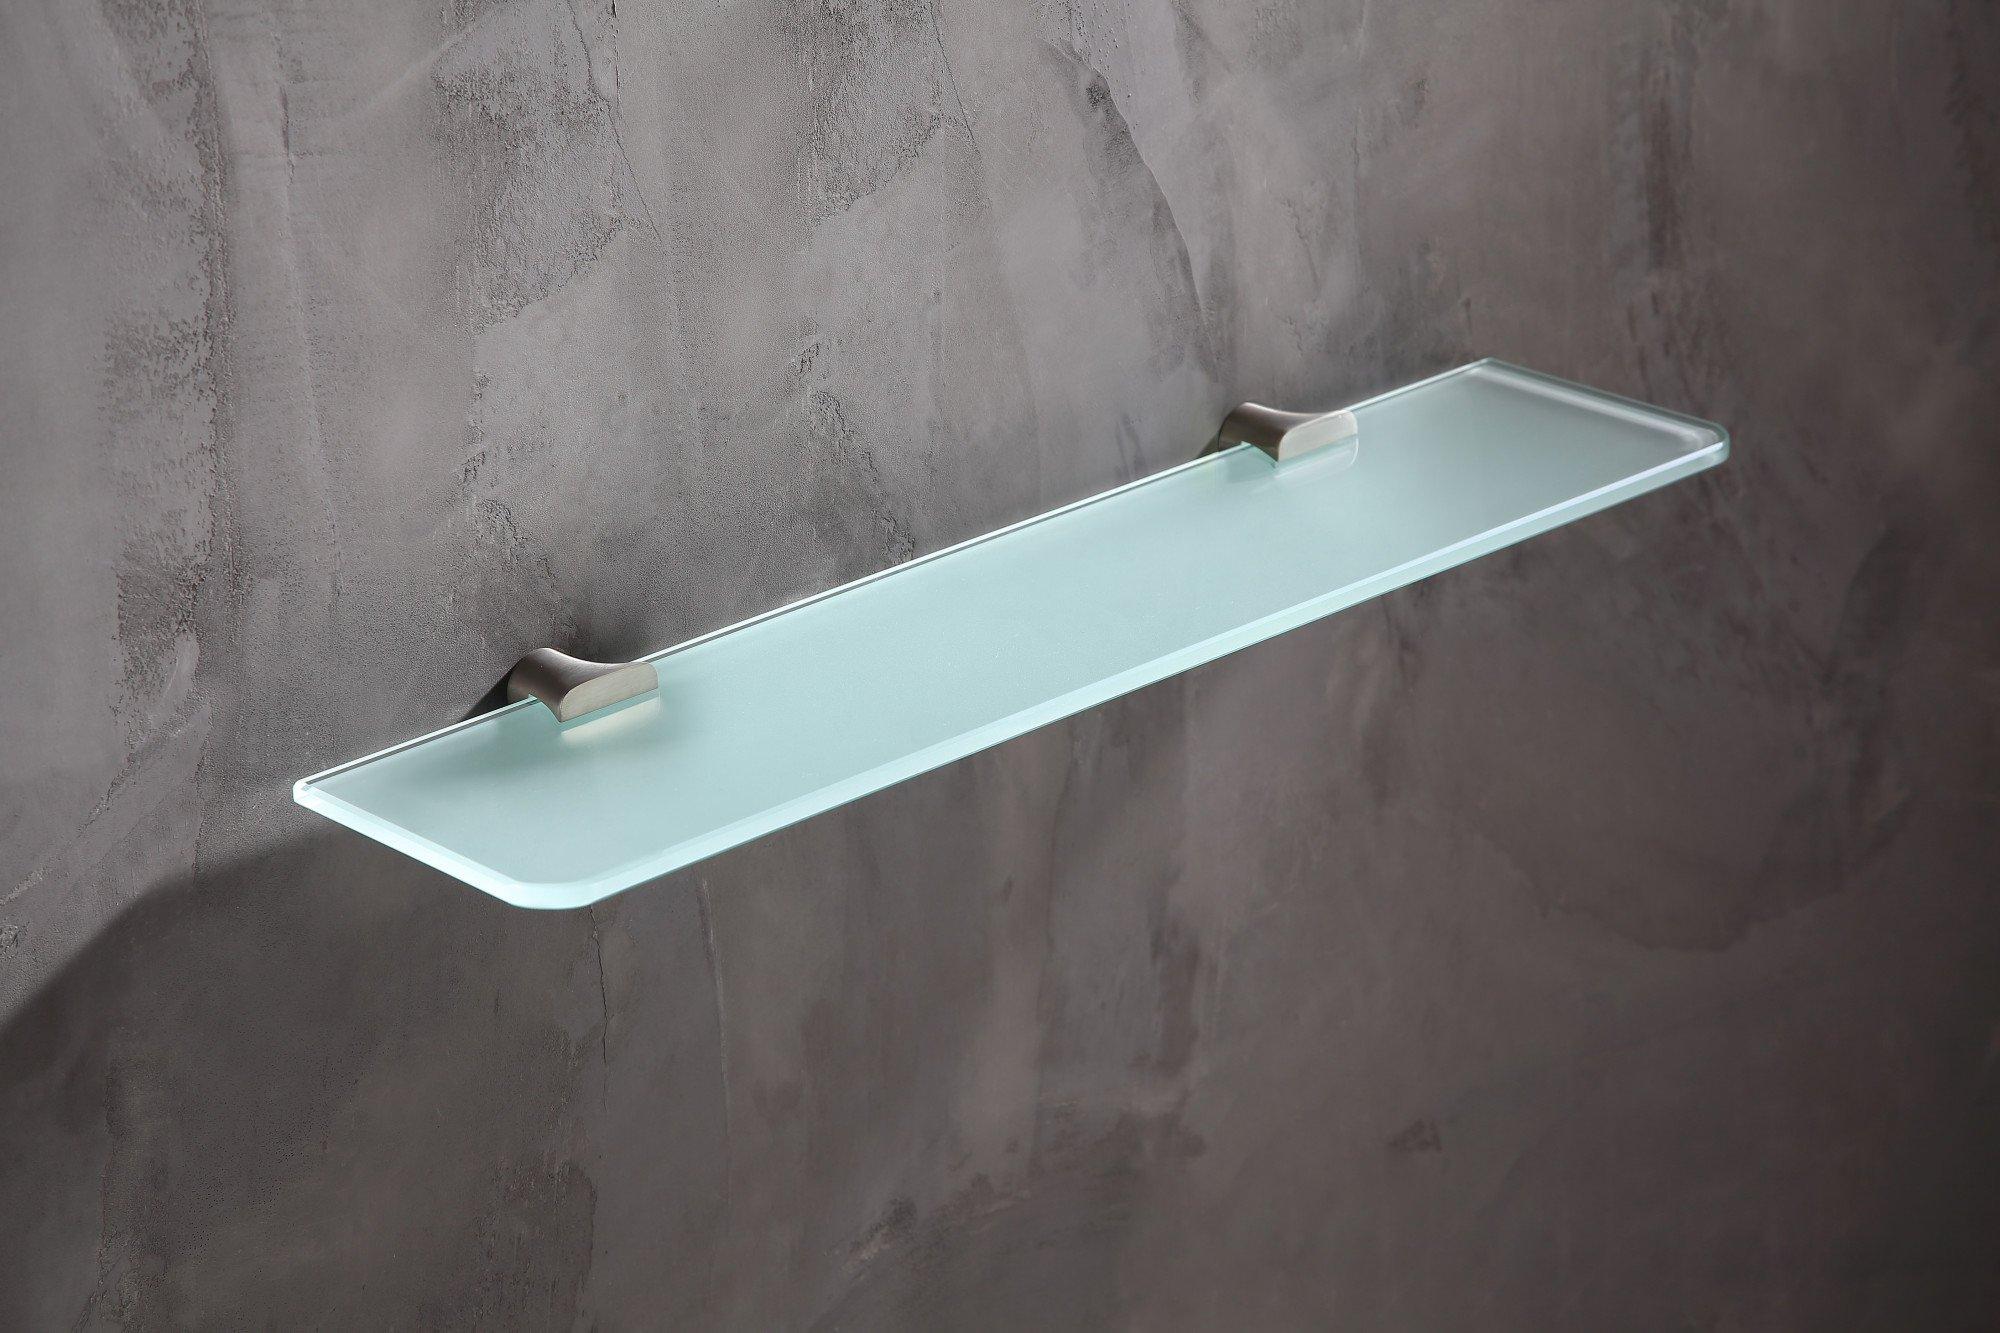 19.69'' Glass Shelf - Brushed Nickel - Essence Series AC-AZ050BN - ANZZI by ANZZI (Image #4)